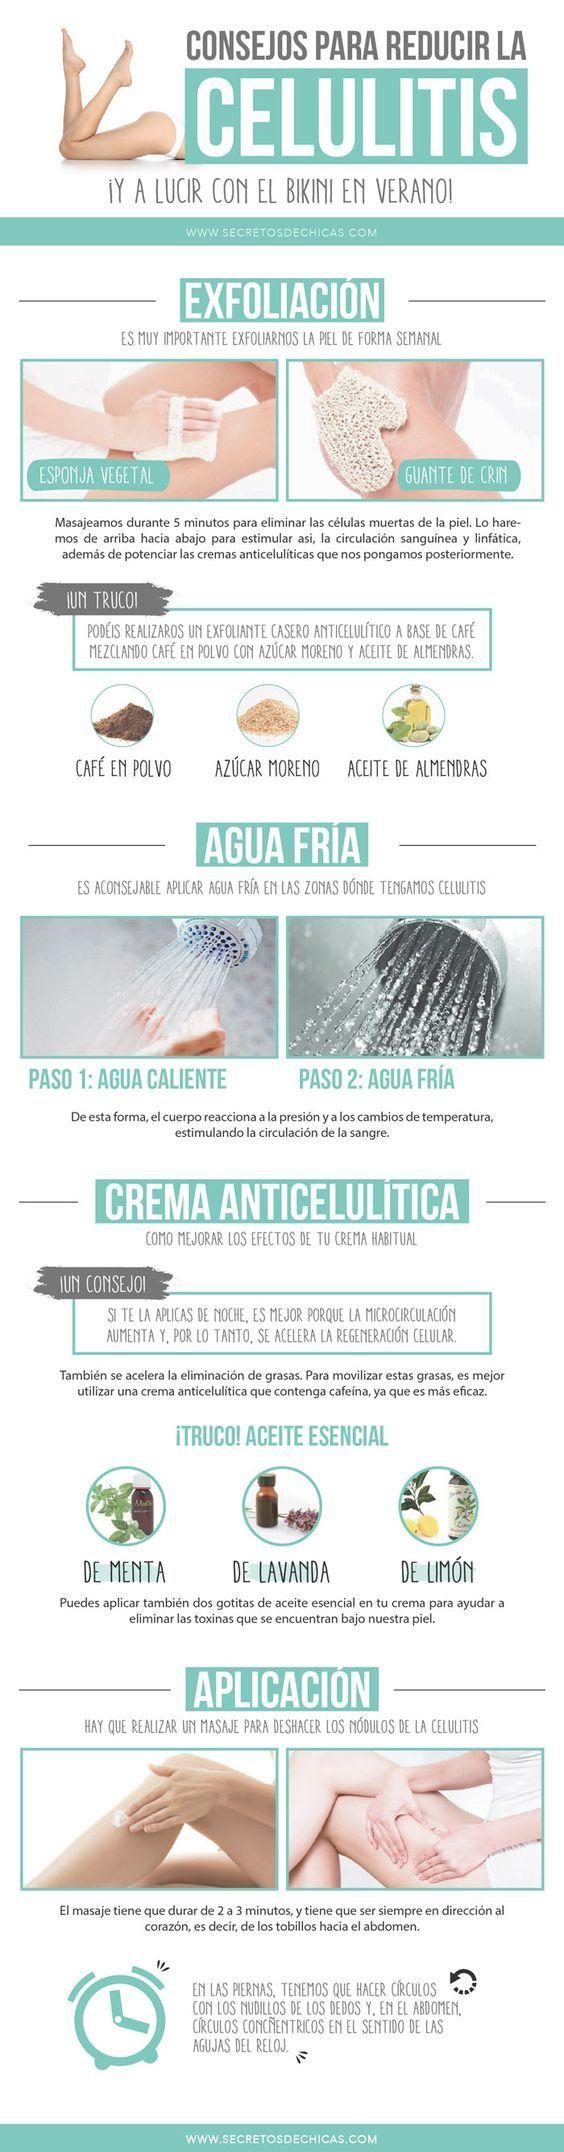 Cómo eliminar la celulitis: